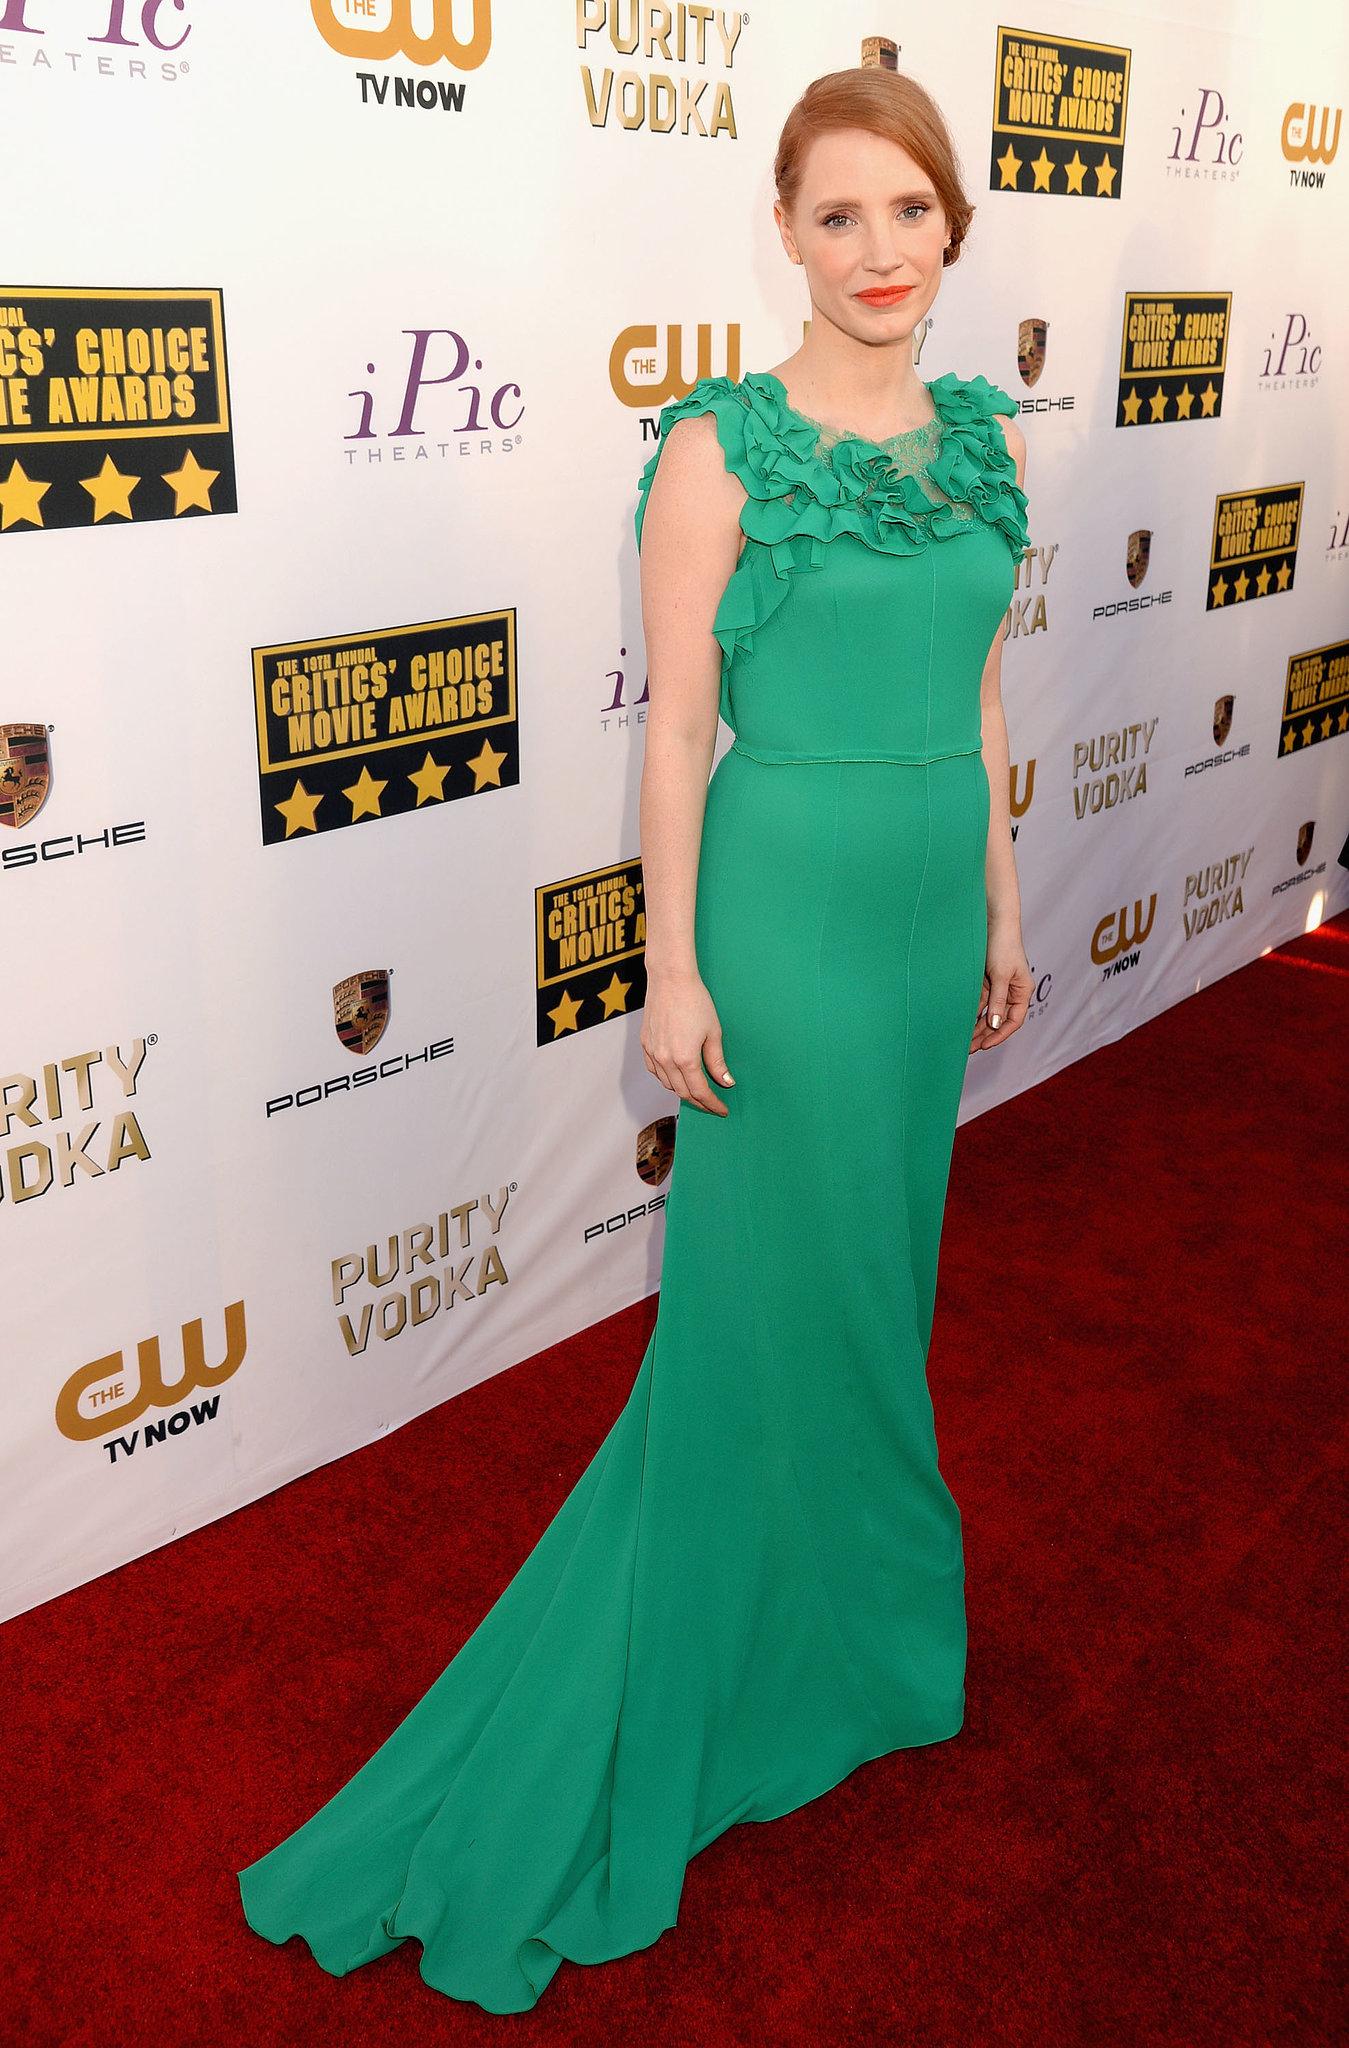 Jessica Chastain at the Critics' Choice Awards 2014